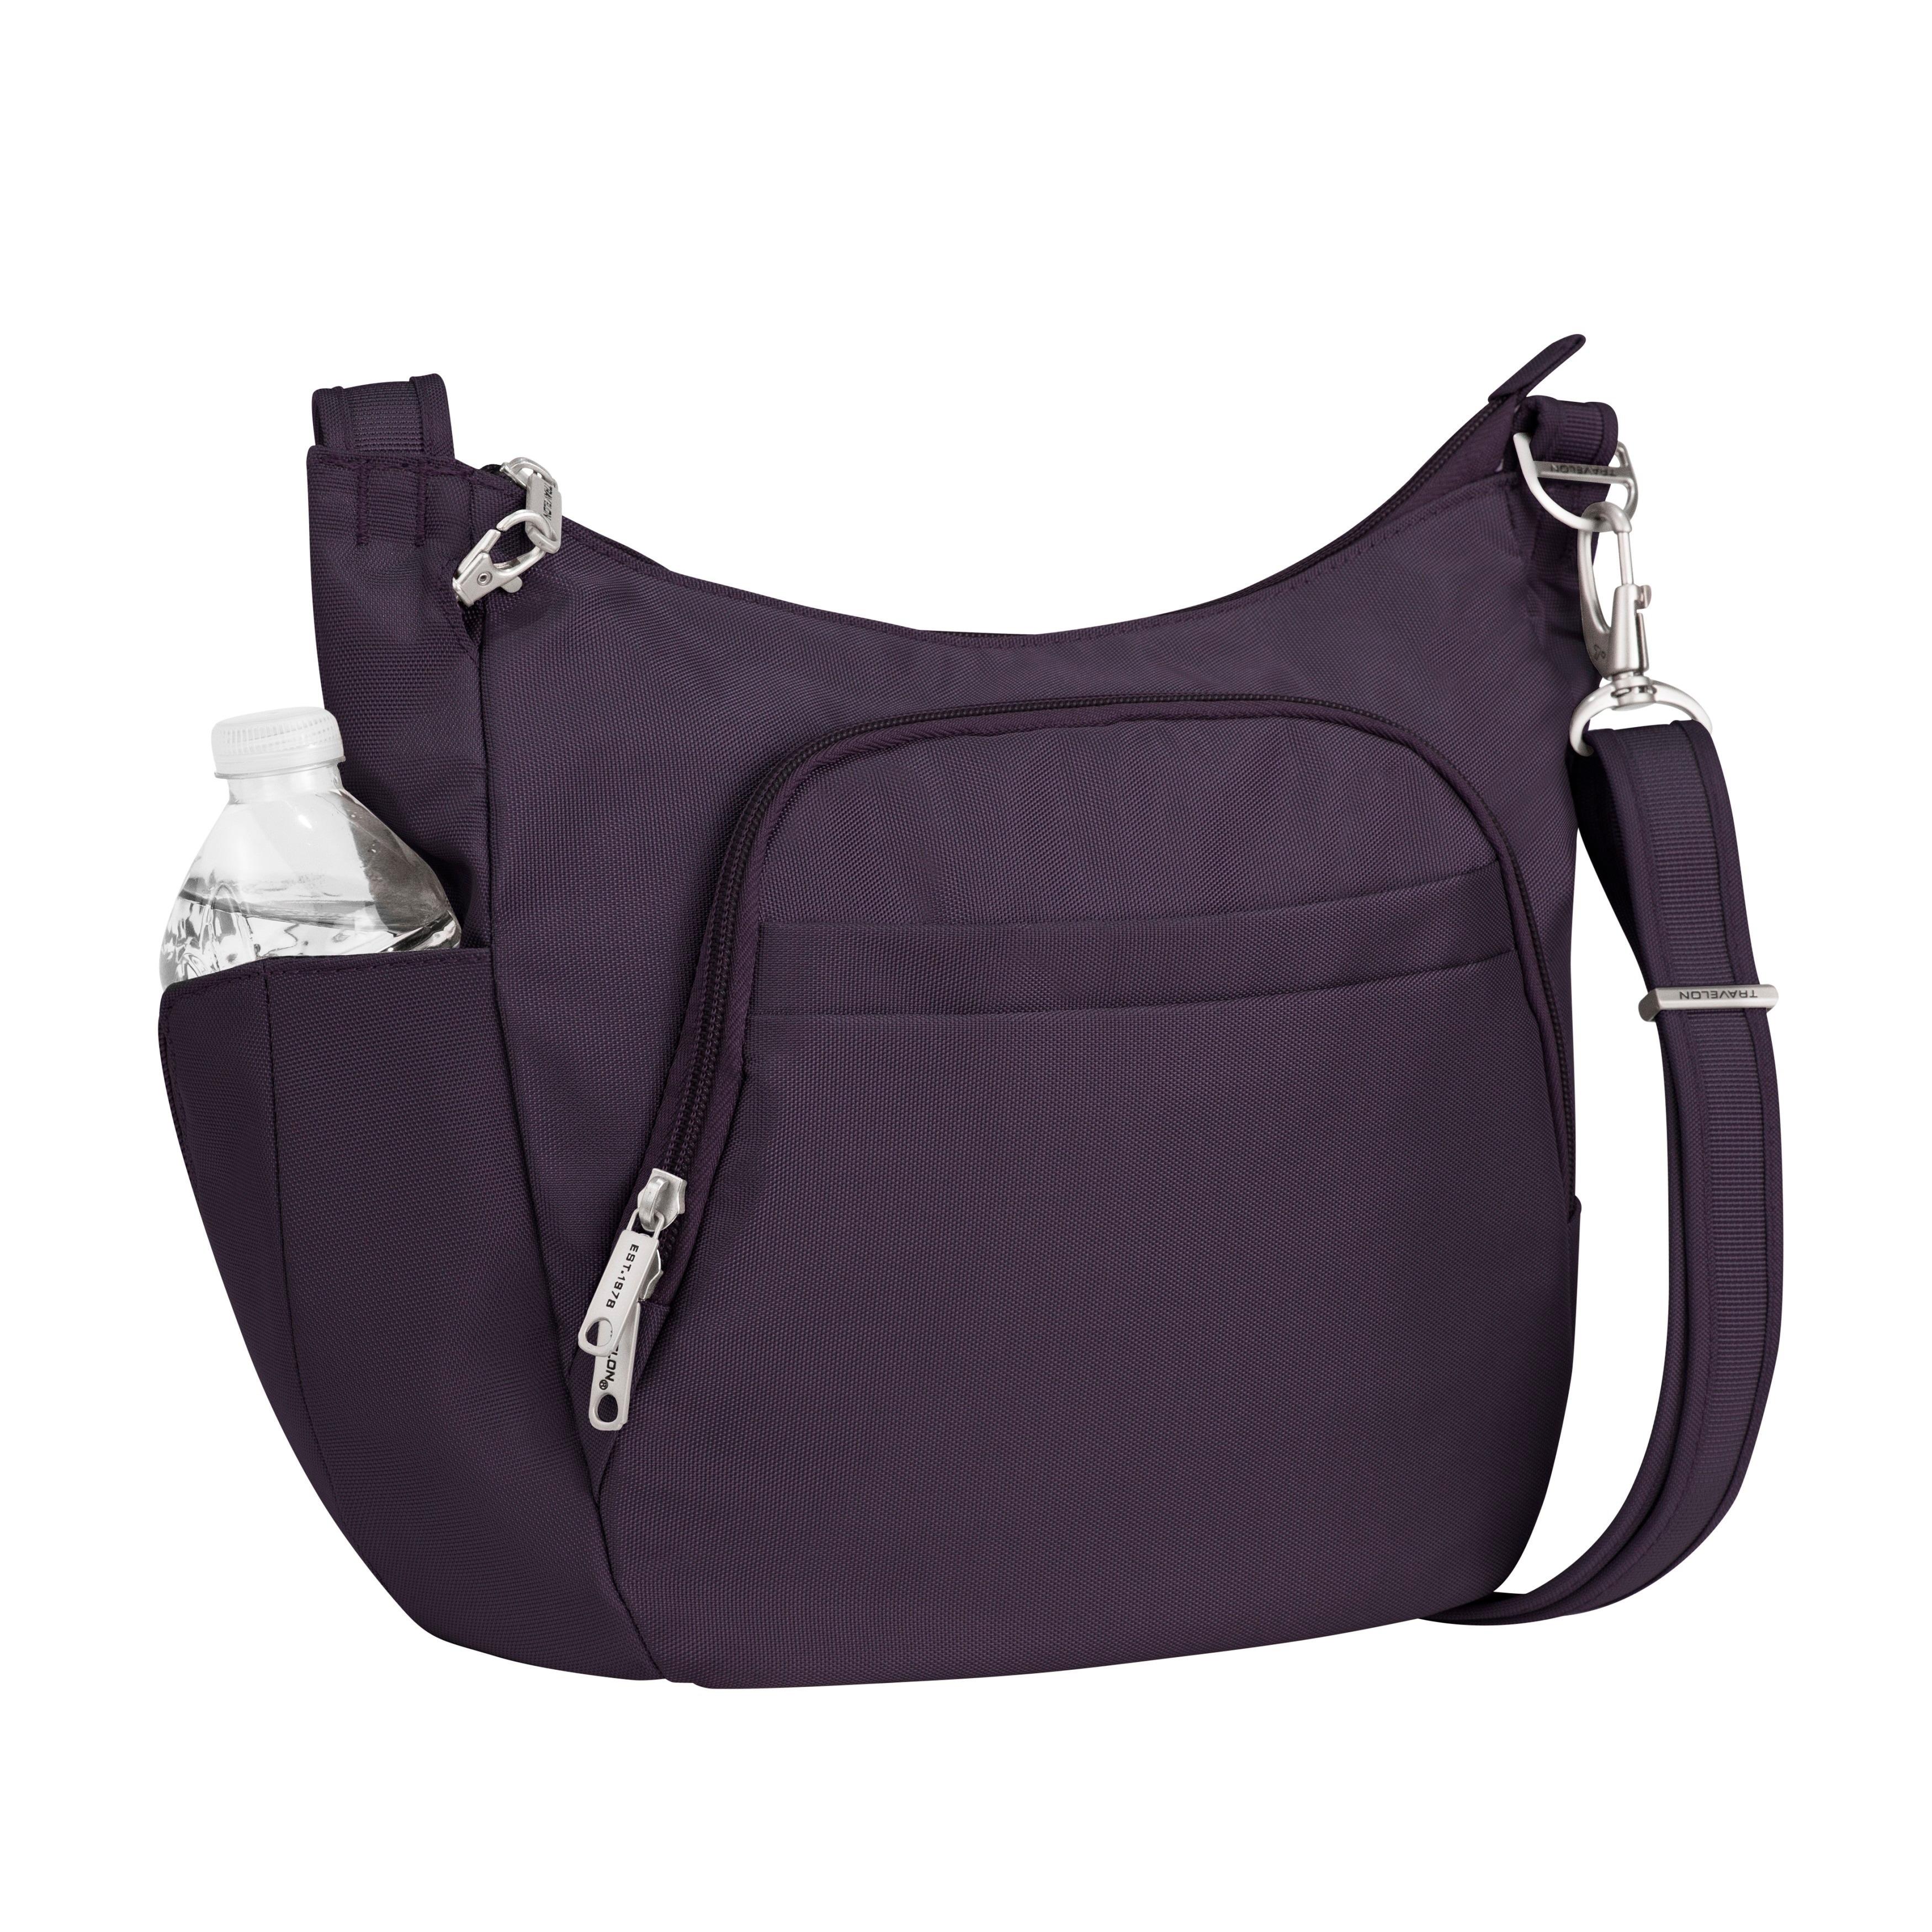 ea83331e58b3b5 Shop Travelon Anti-theft Classic Cross-body Bucket Bag - Free Shipping On  Orders Over $45 - Overstock - 8003323